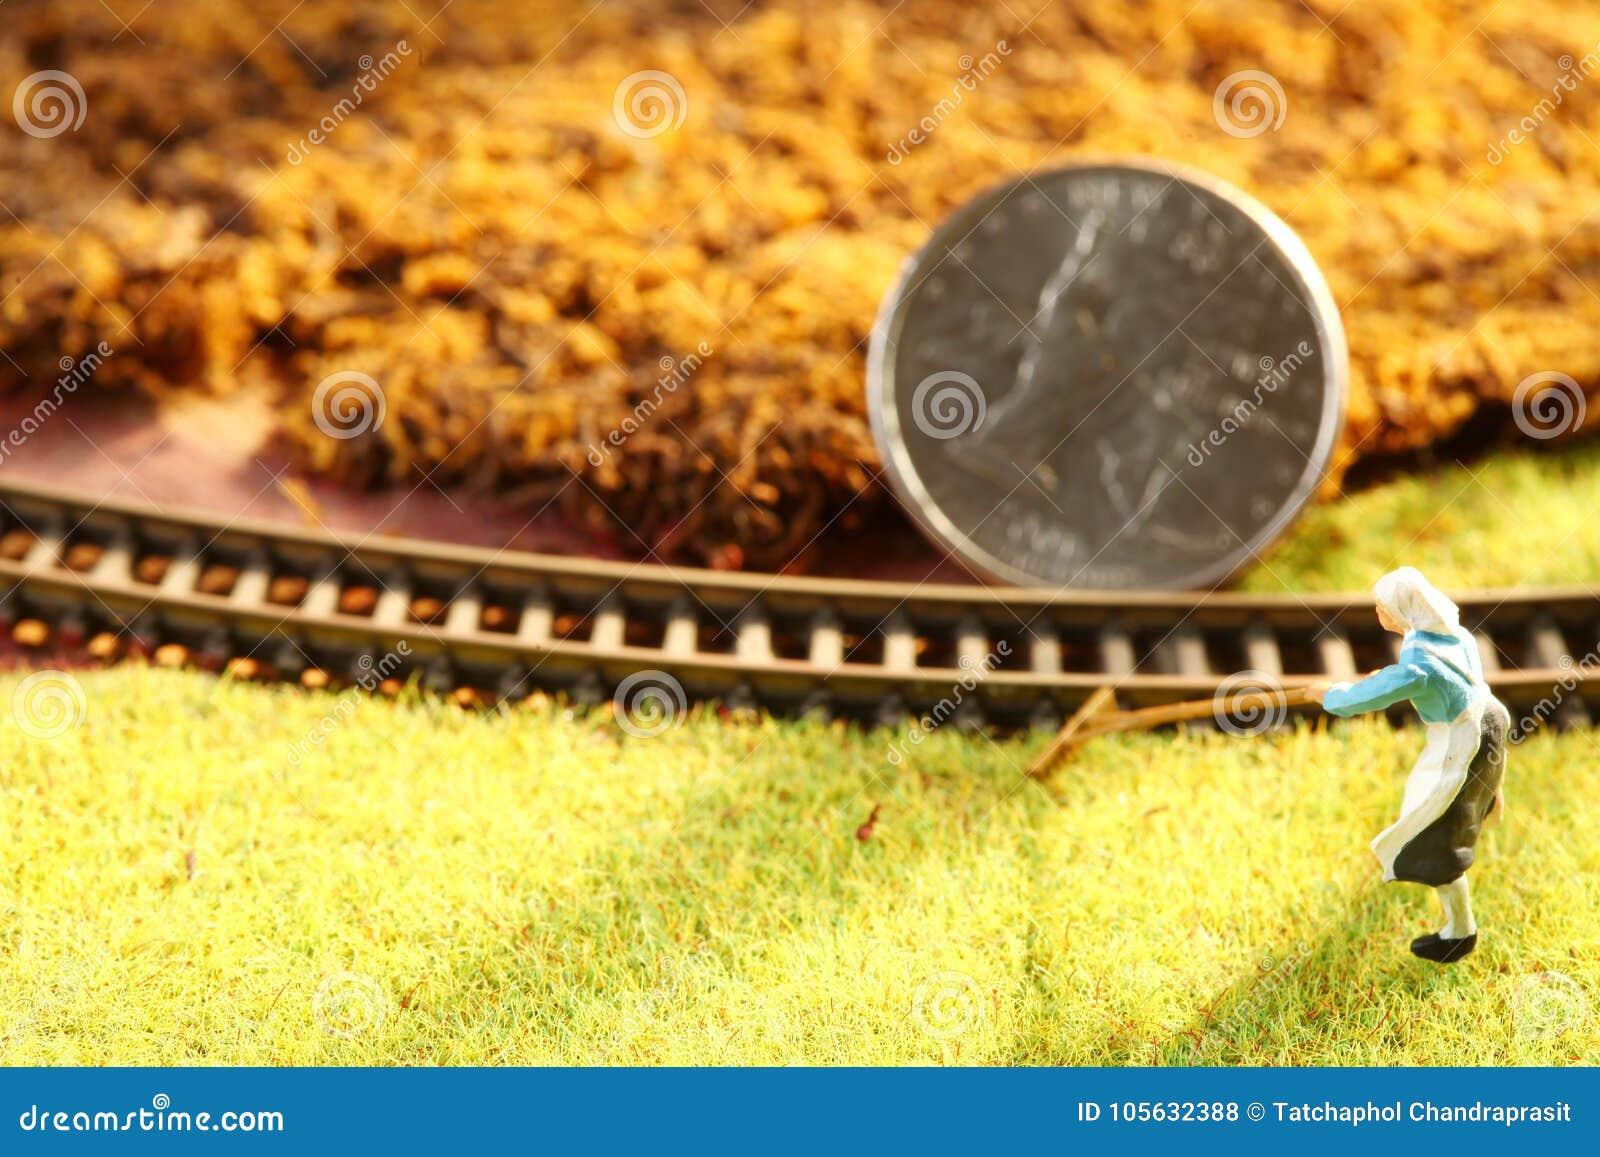 The money coin put on the miniature model railroad scene